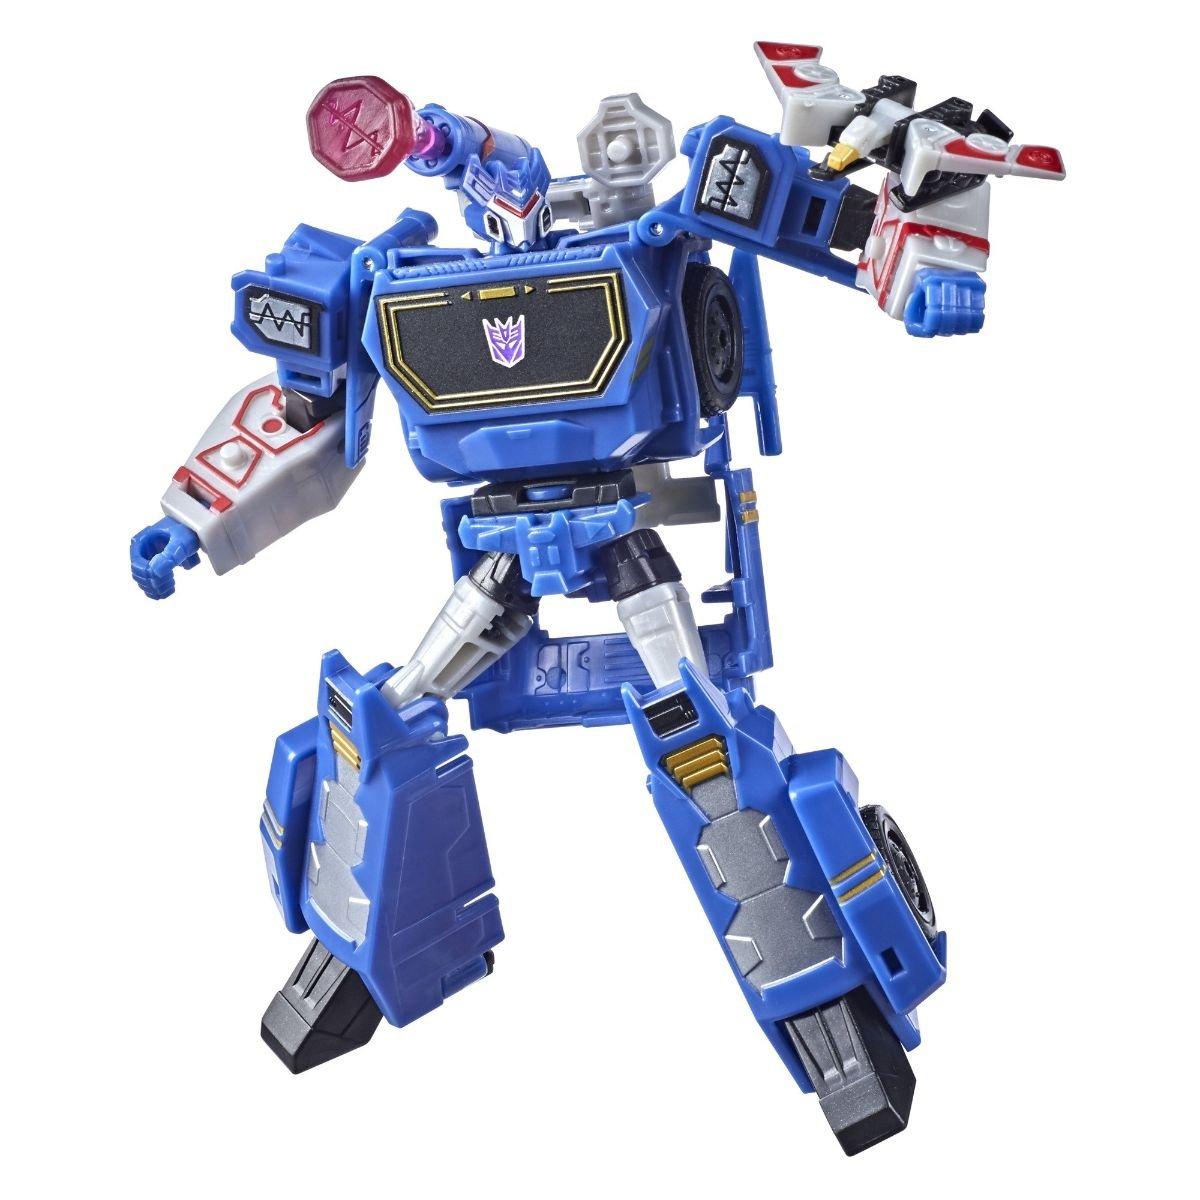 Figurina Transformers Cyberverse Deluxe, Soundwave, F05095